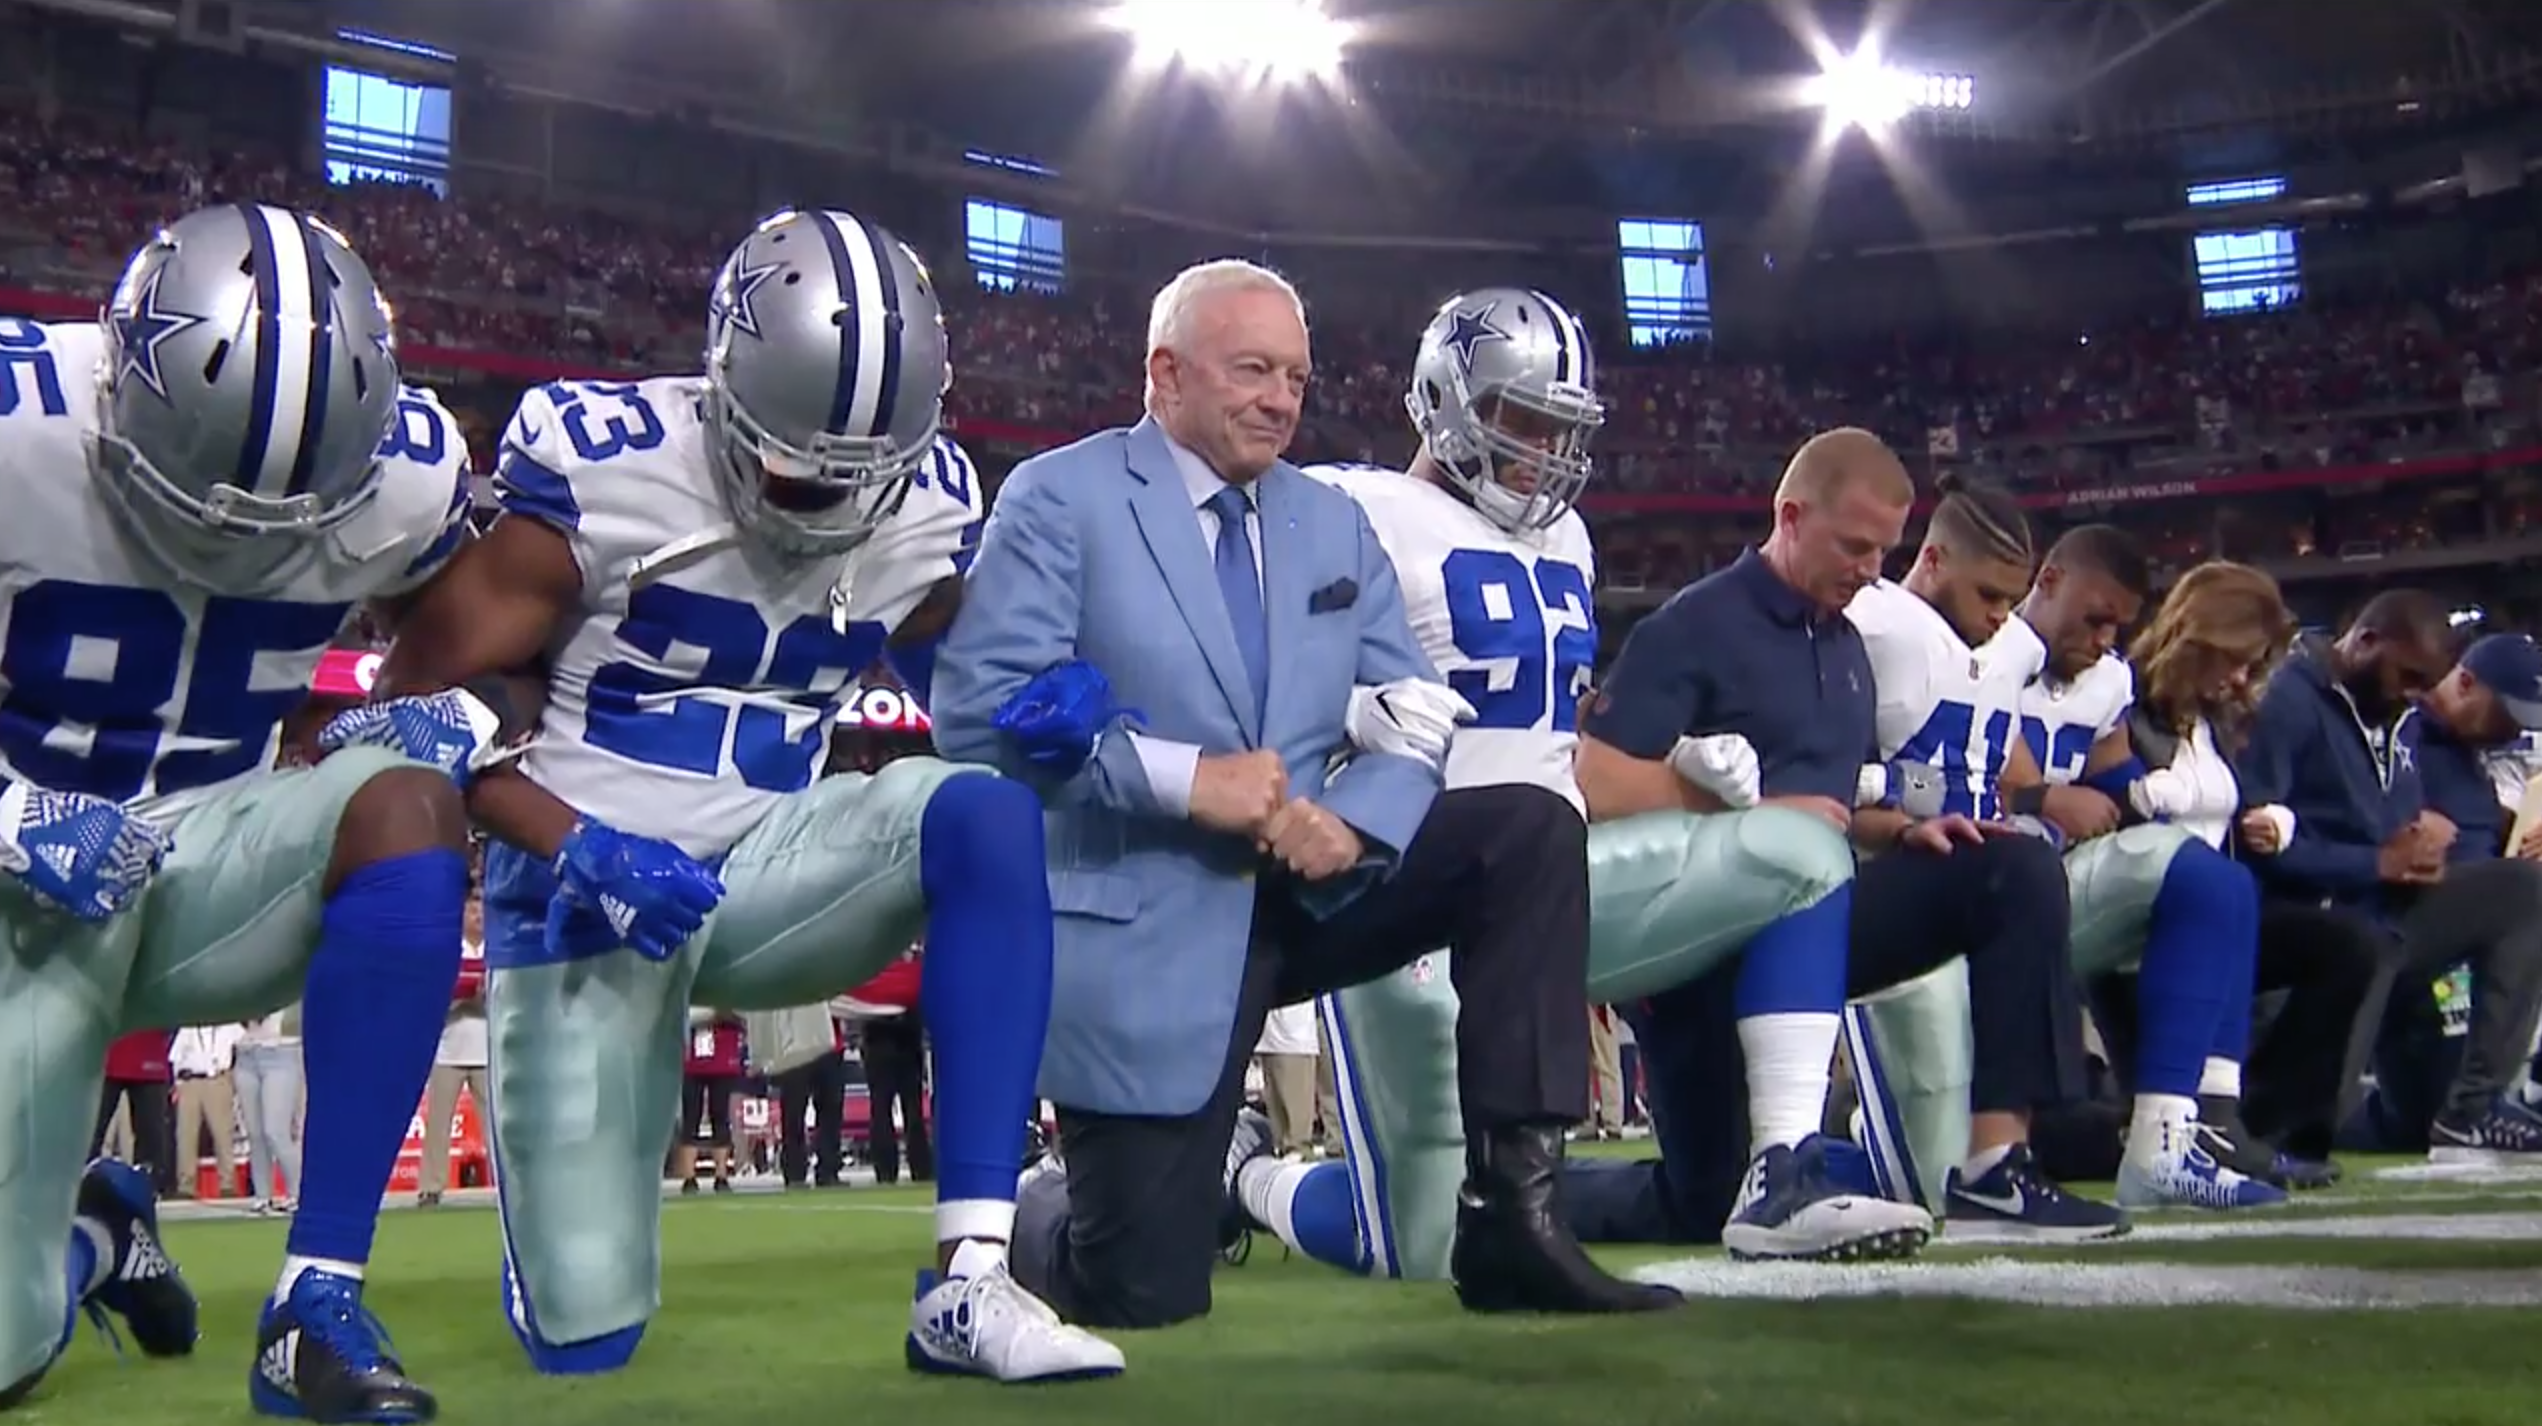 Cowboys kneel during national anthem (photo) | SI.com